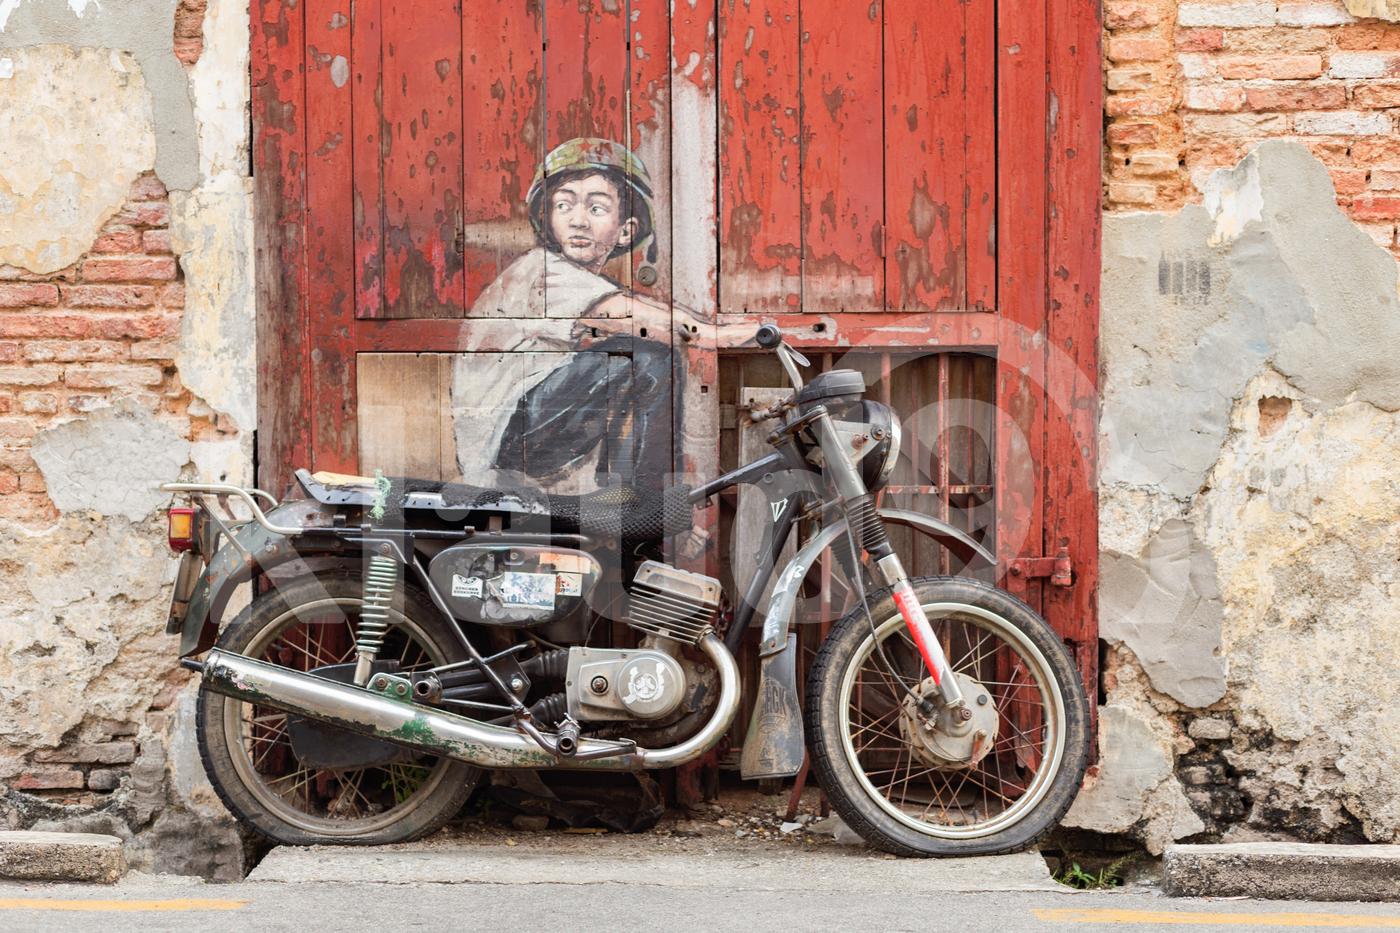 Old motorcycle used in street art